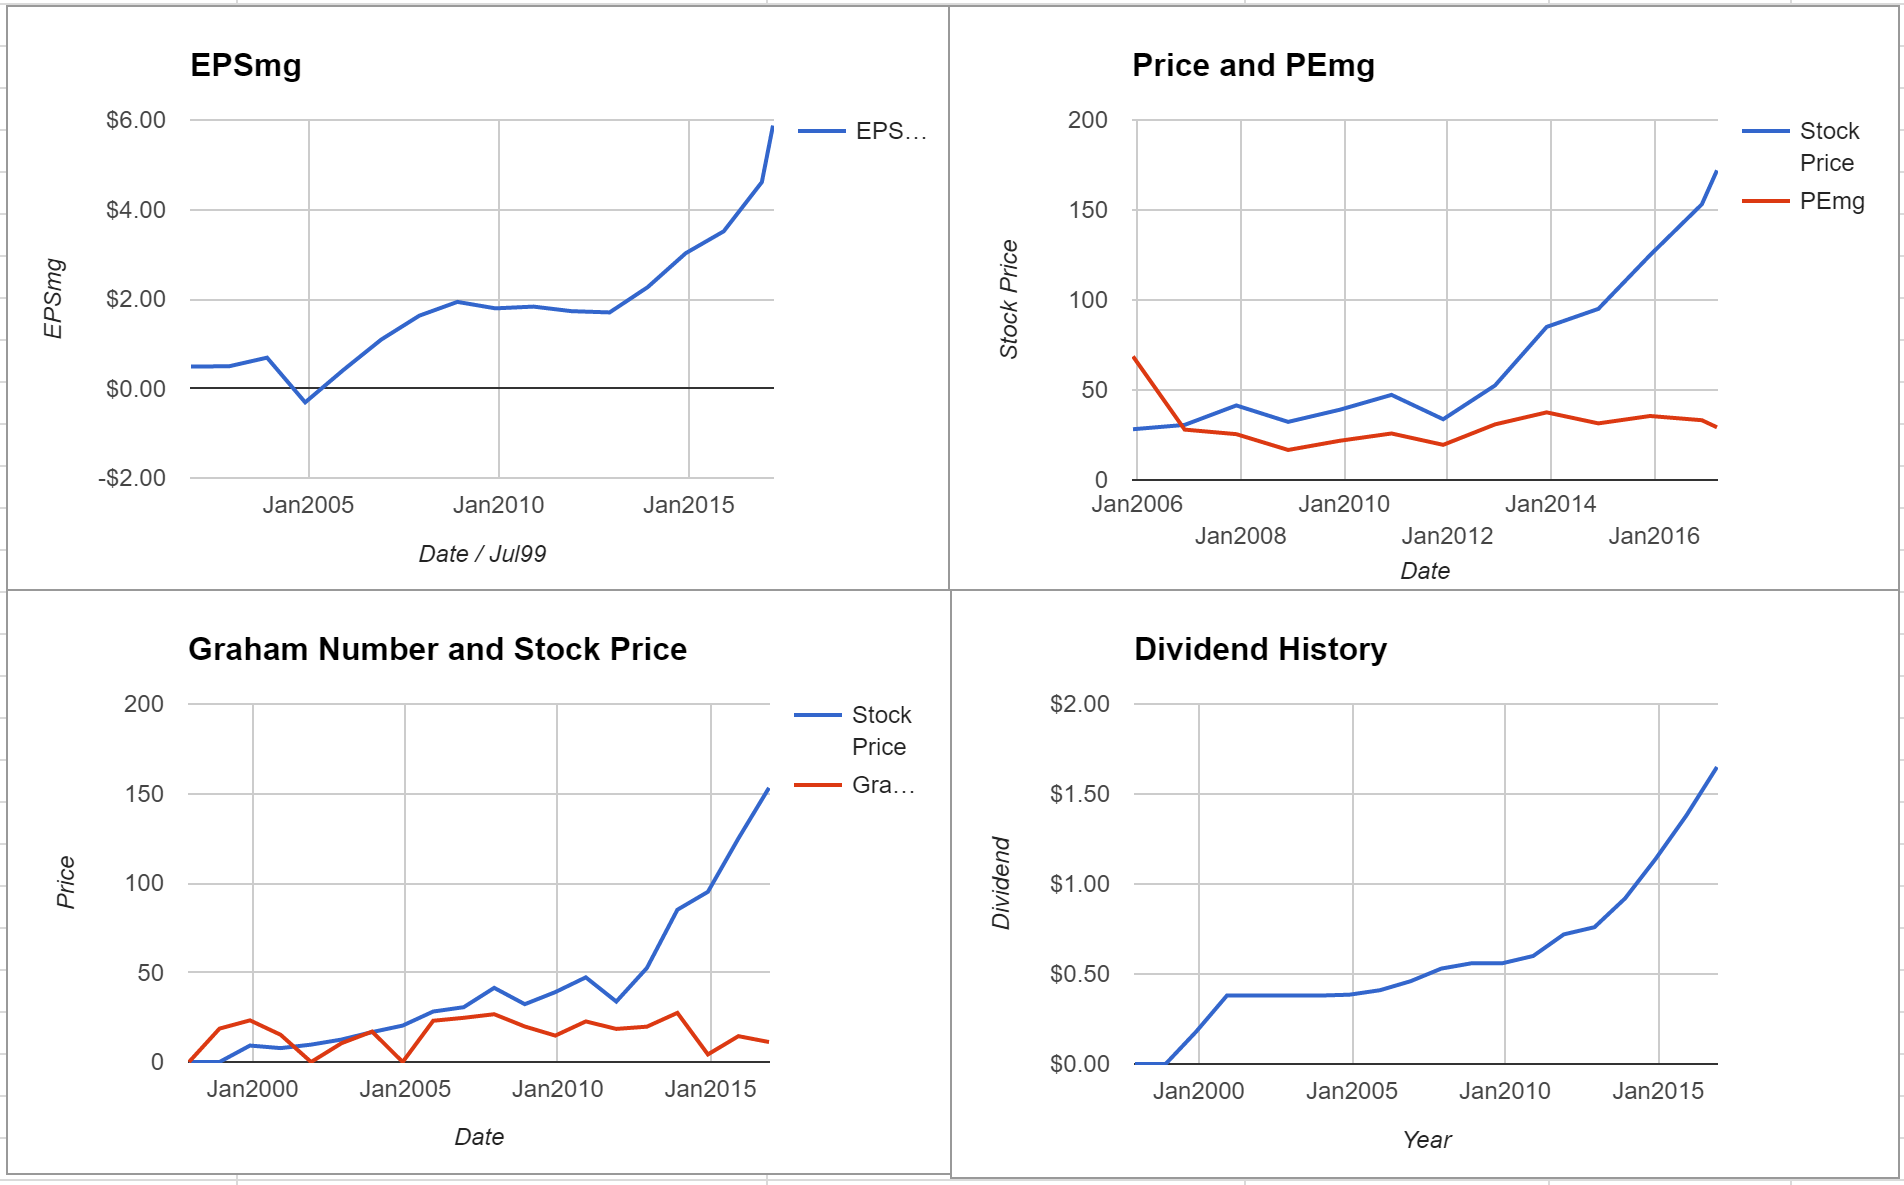 Lennox International Inc Valuation – Initial Coverage $LII